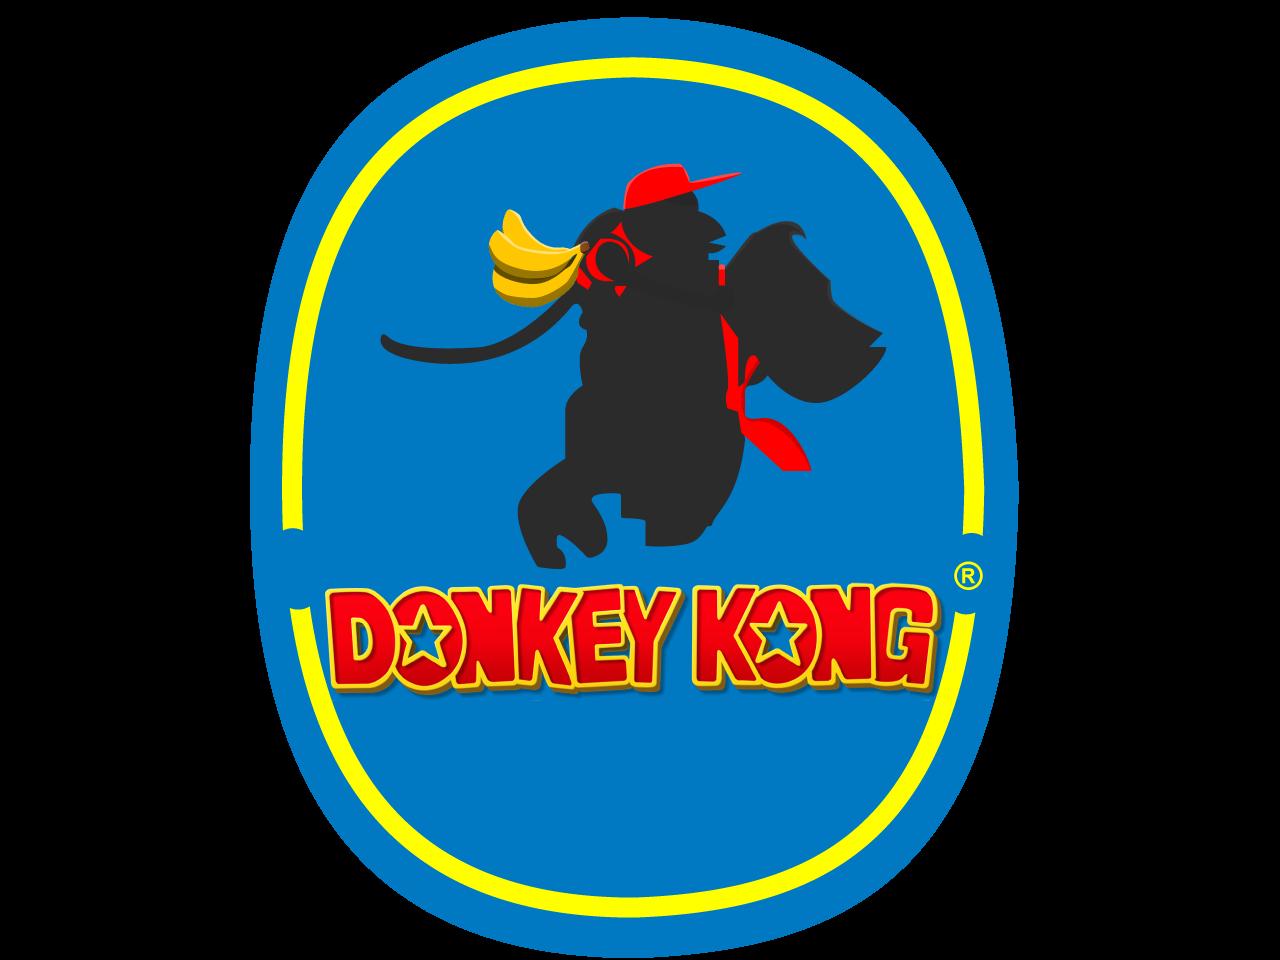 Donkey Kong Banana Company Logo produce fruits bananas donkey kong nintendo graphic design blue logo designer brand icon illustrator color adobe digital branding illustration vector graphic design